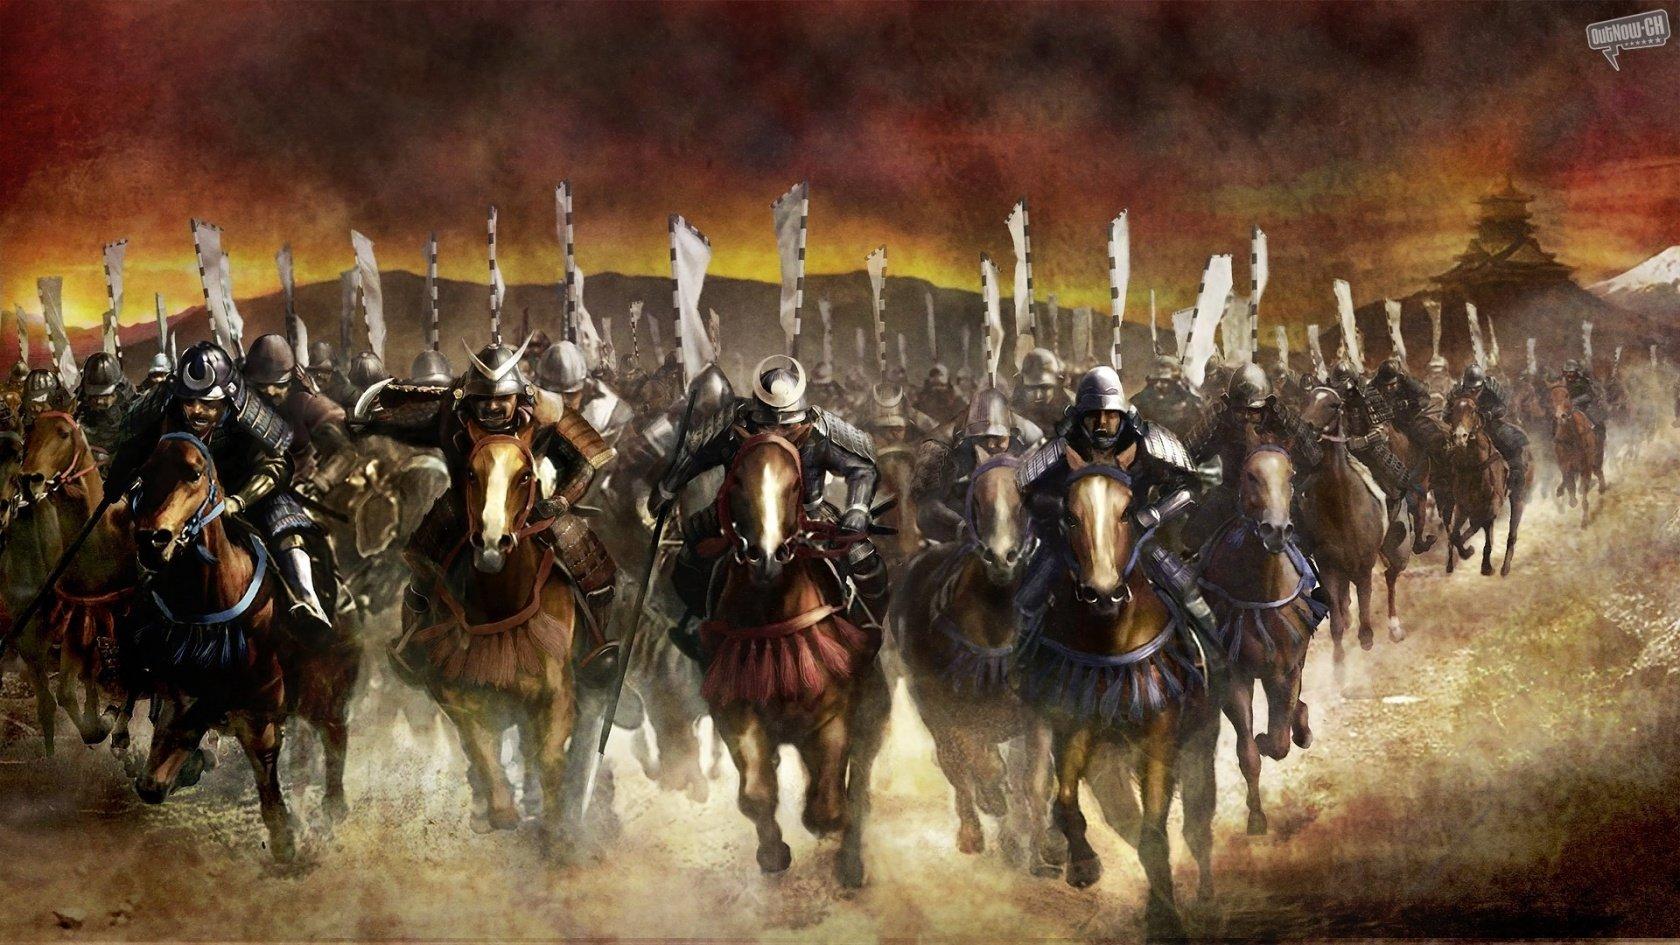 Total War: Shogun 2 Full HD Wallpaper and Background | 1920x1080 ...